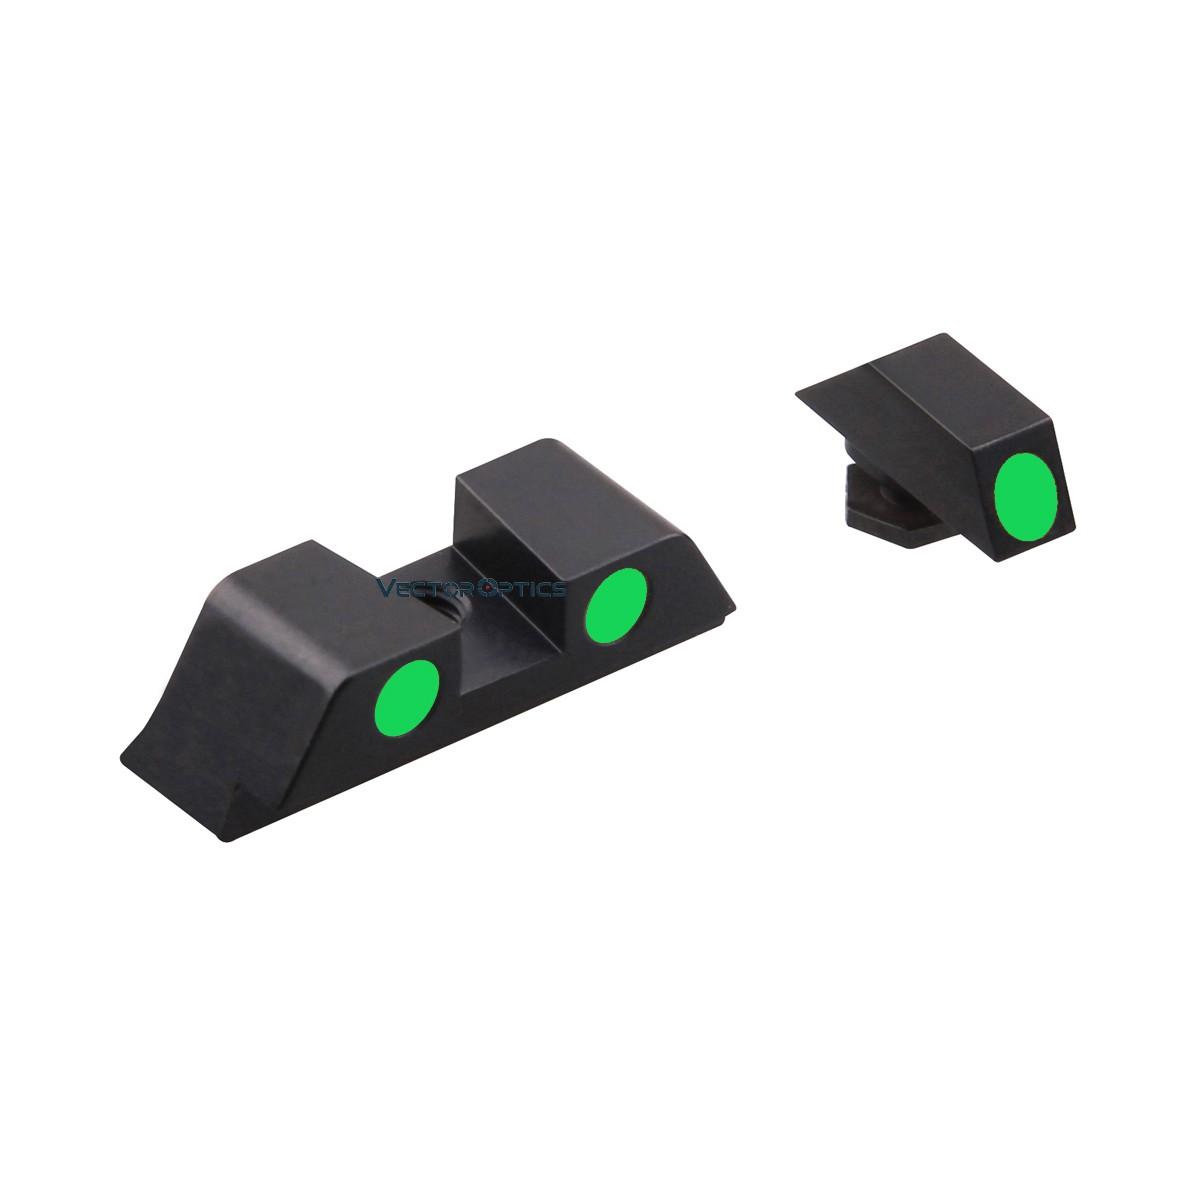 SA Fiber Sights Combo for Pistol